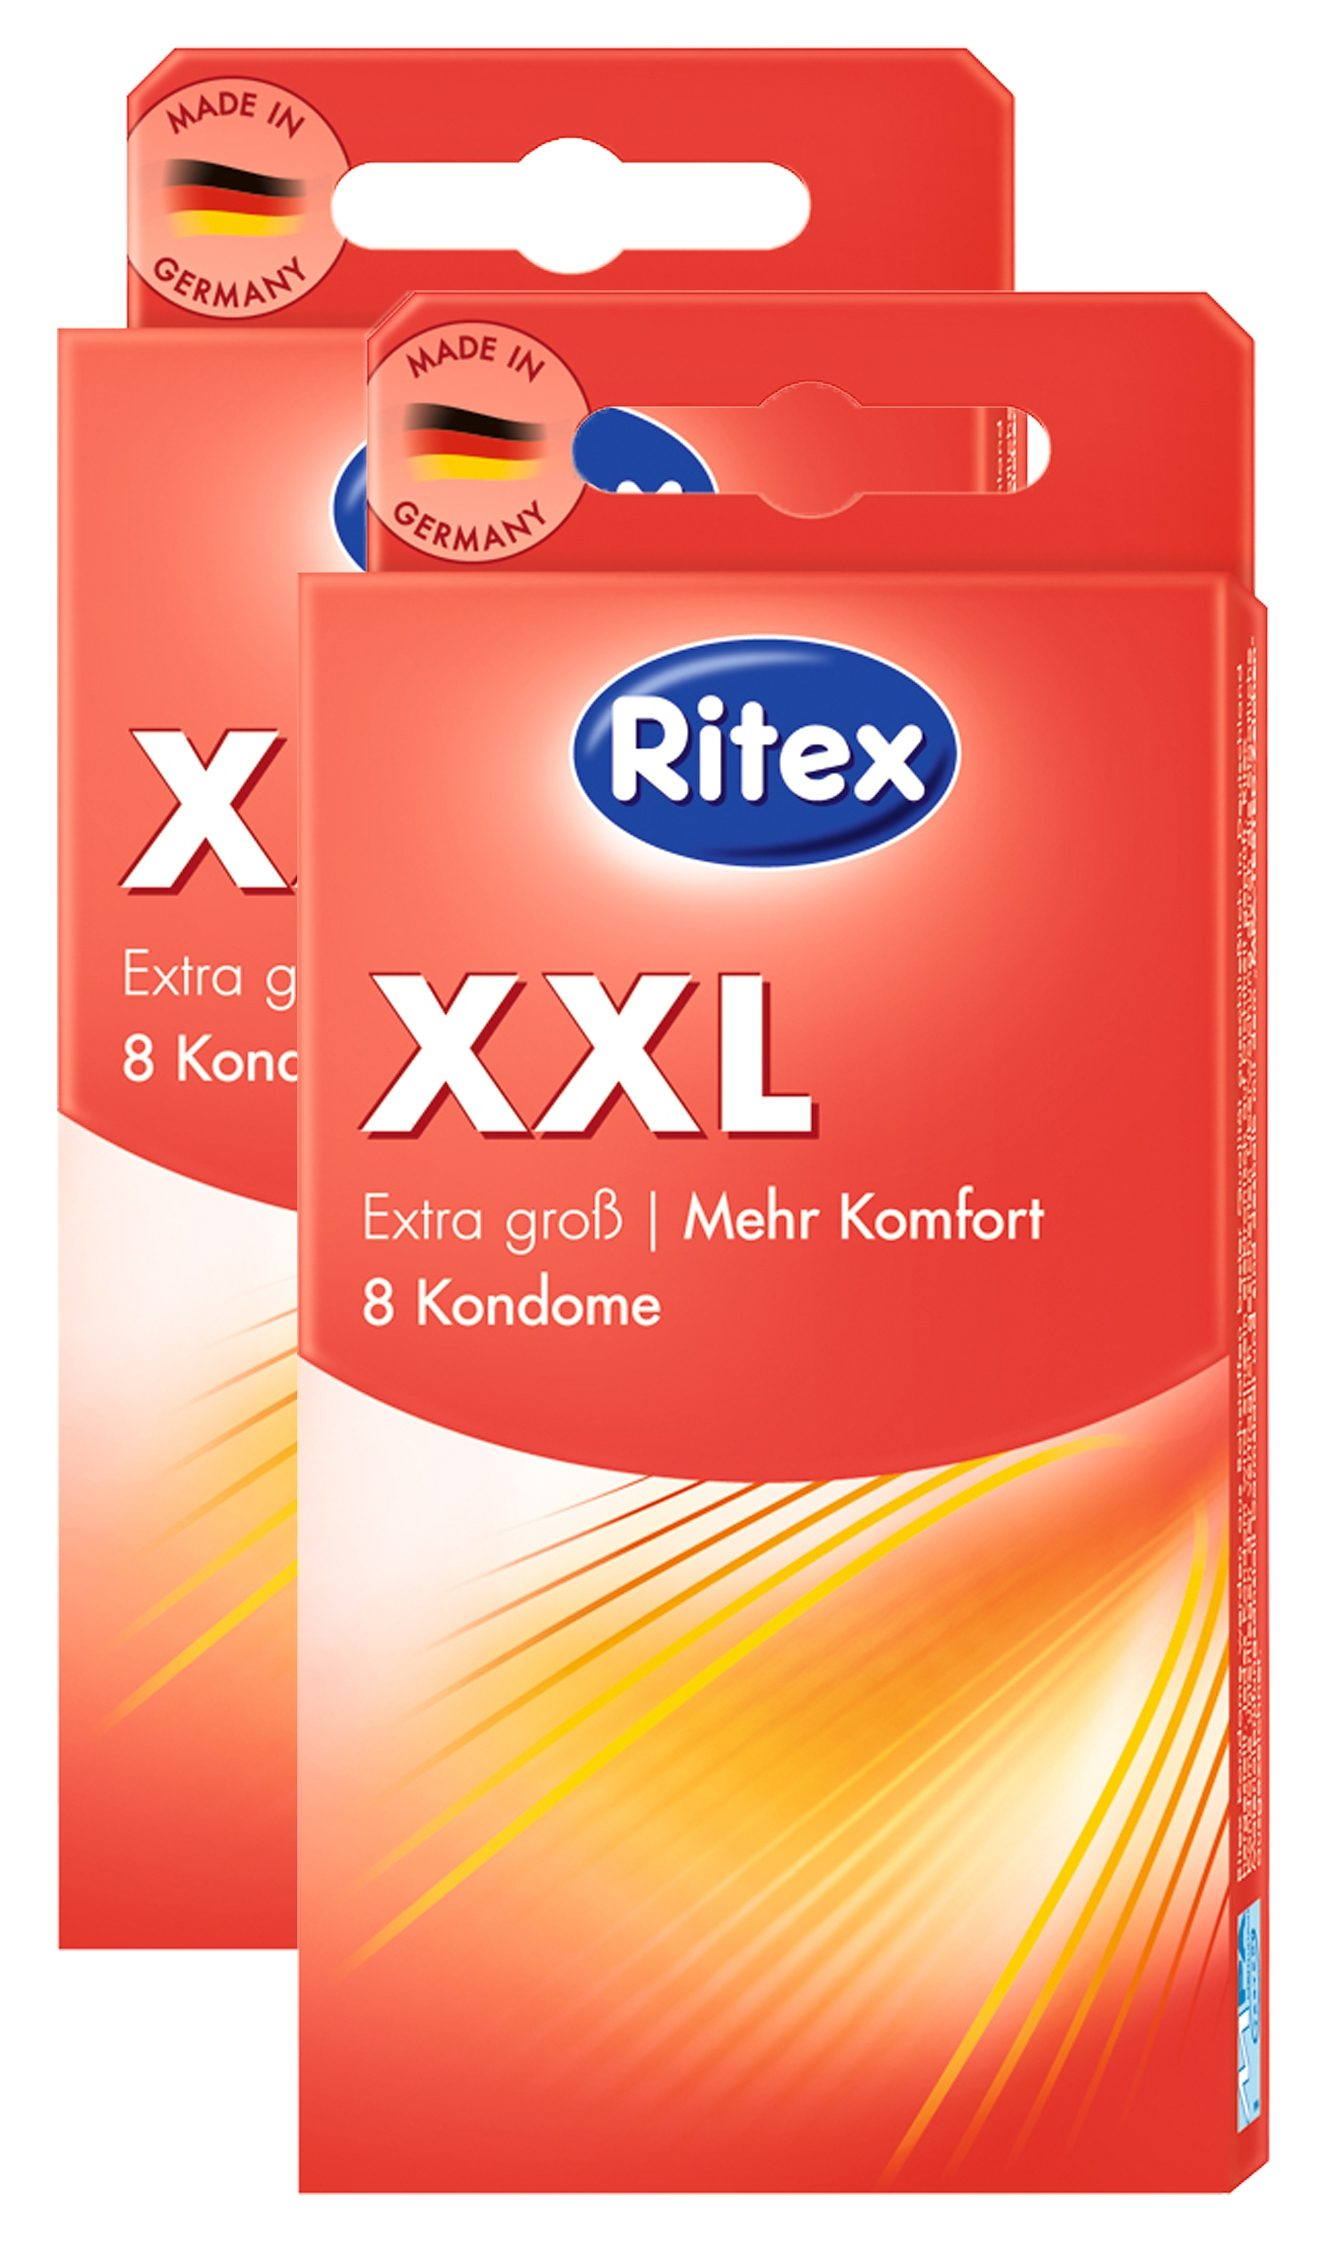 Ritex Kondome »XXL«, 2x8er/3x8er Packung